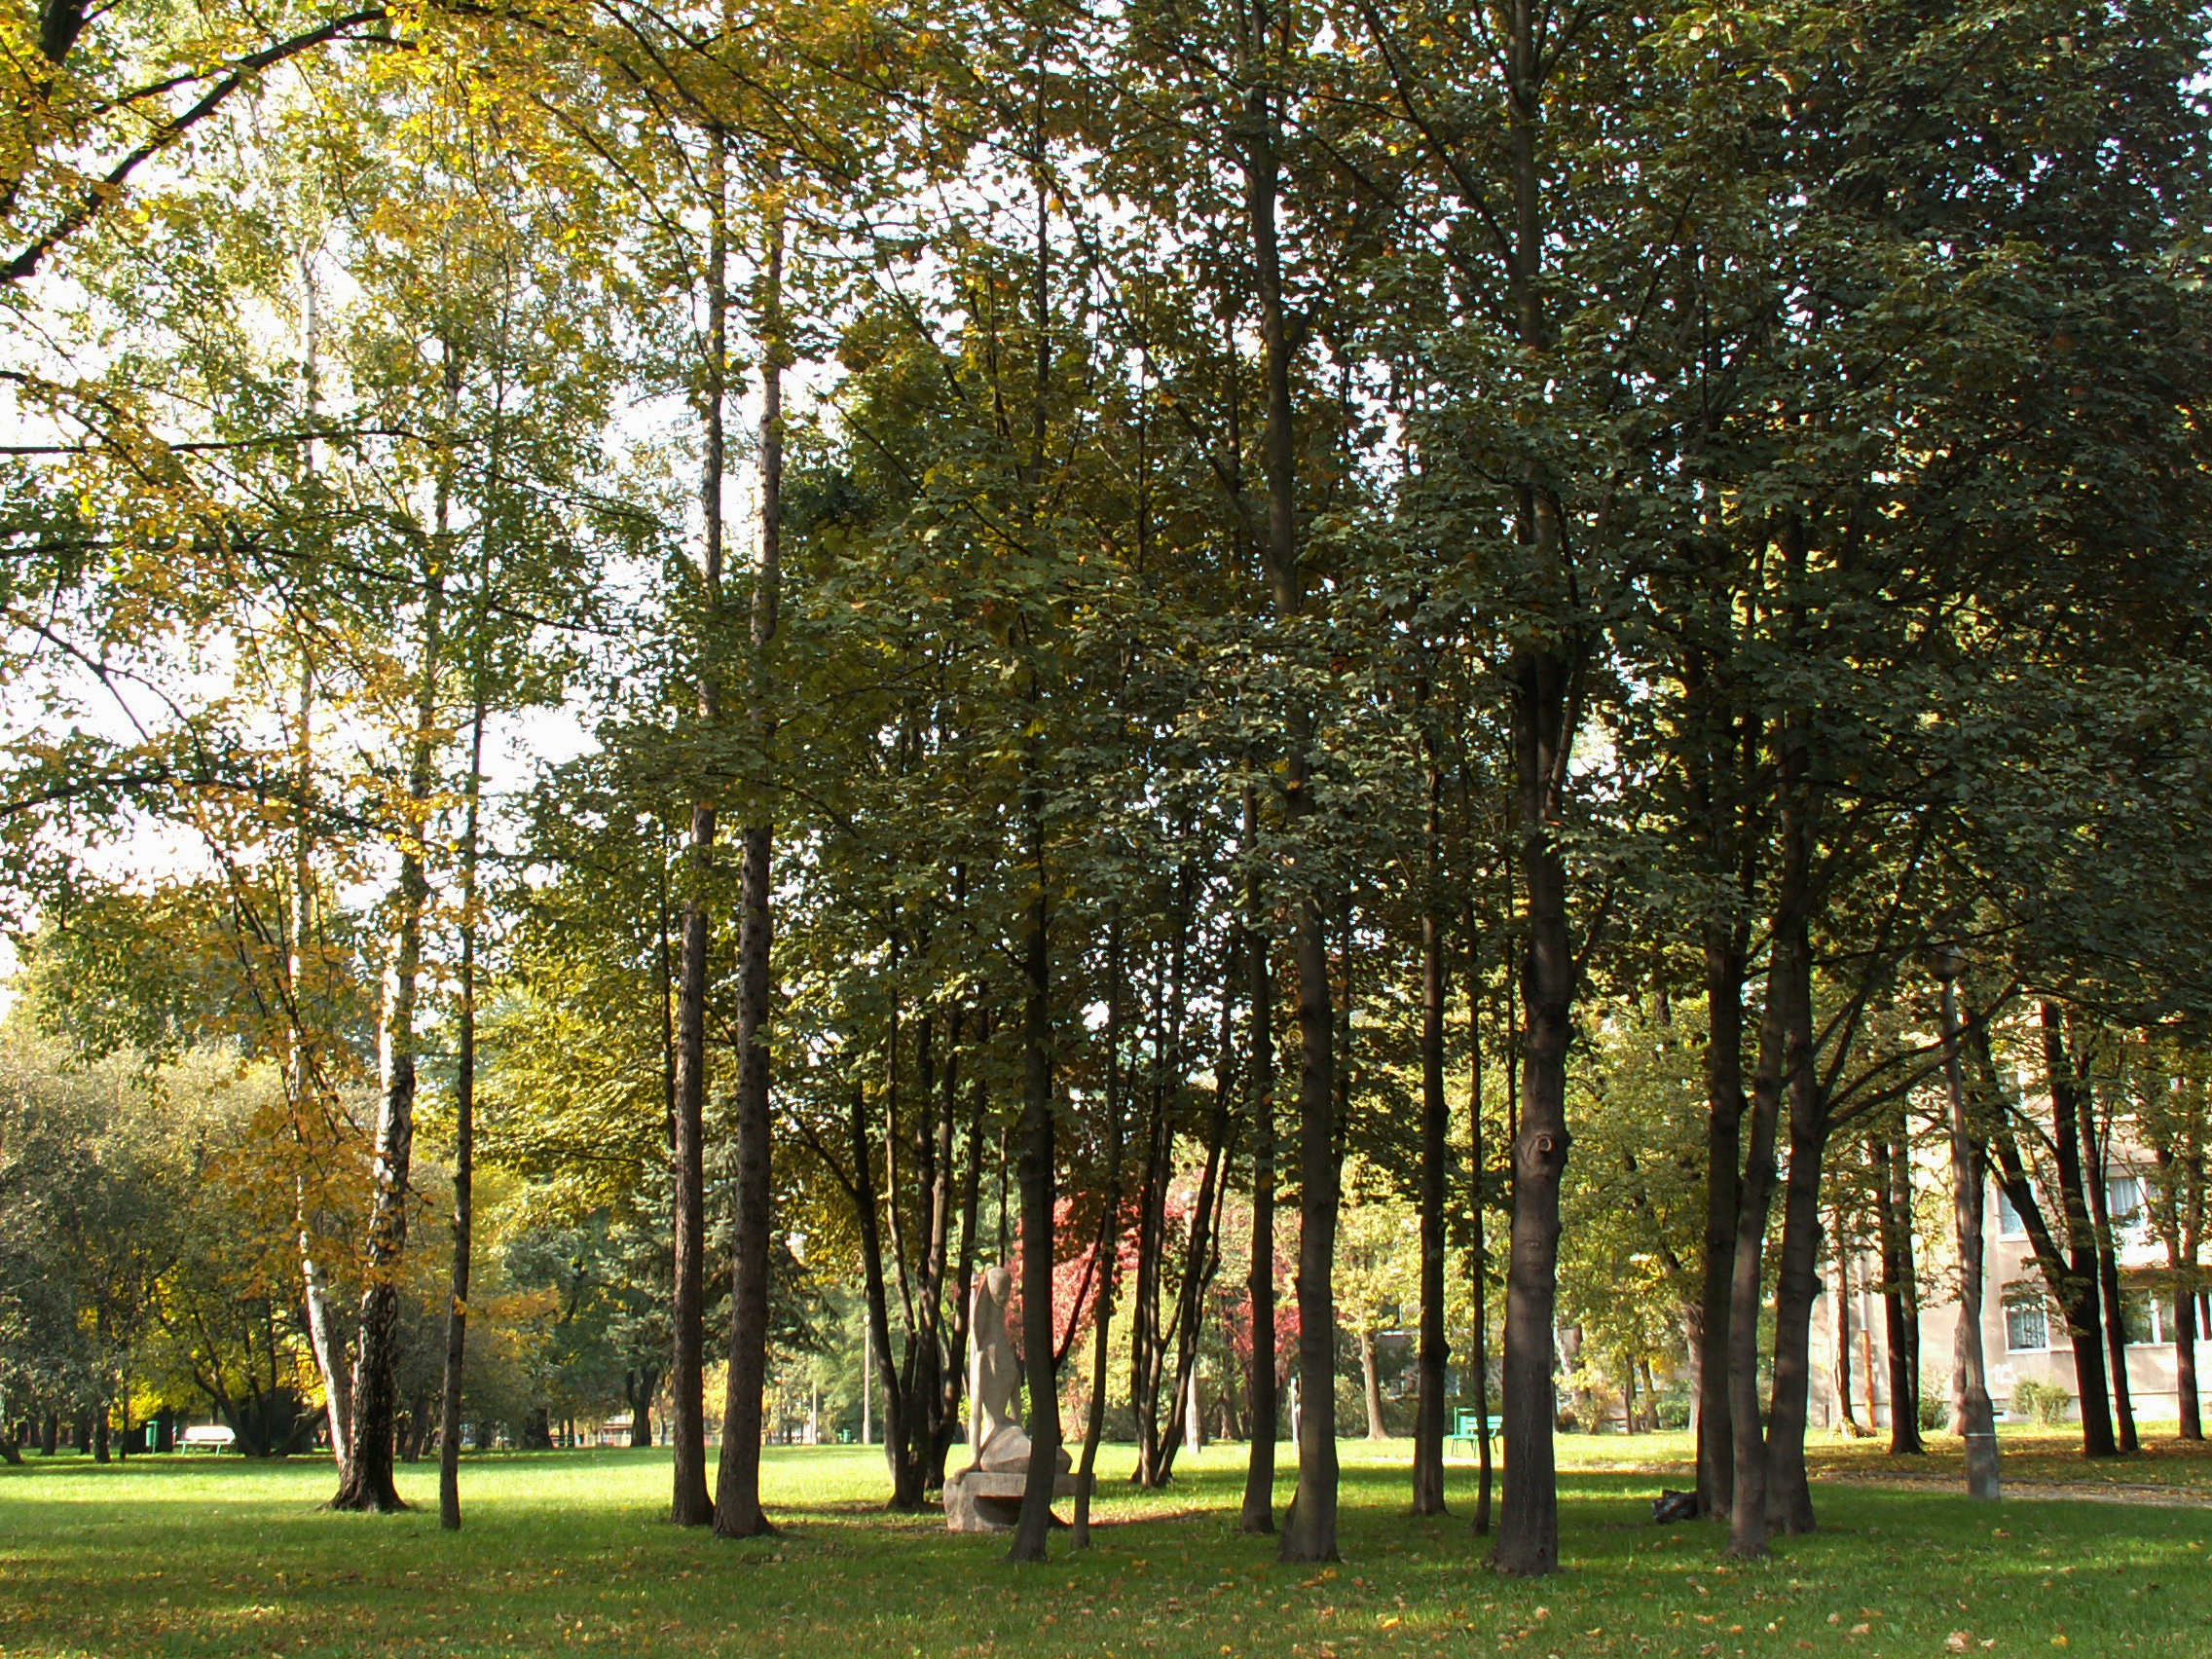 Plik wisniowy sad cherry orchard park os kolorowe nowa for Orchard park